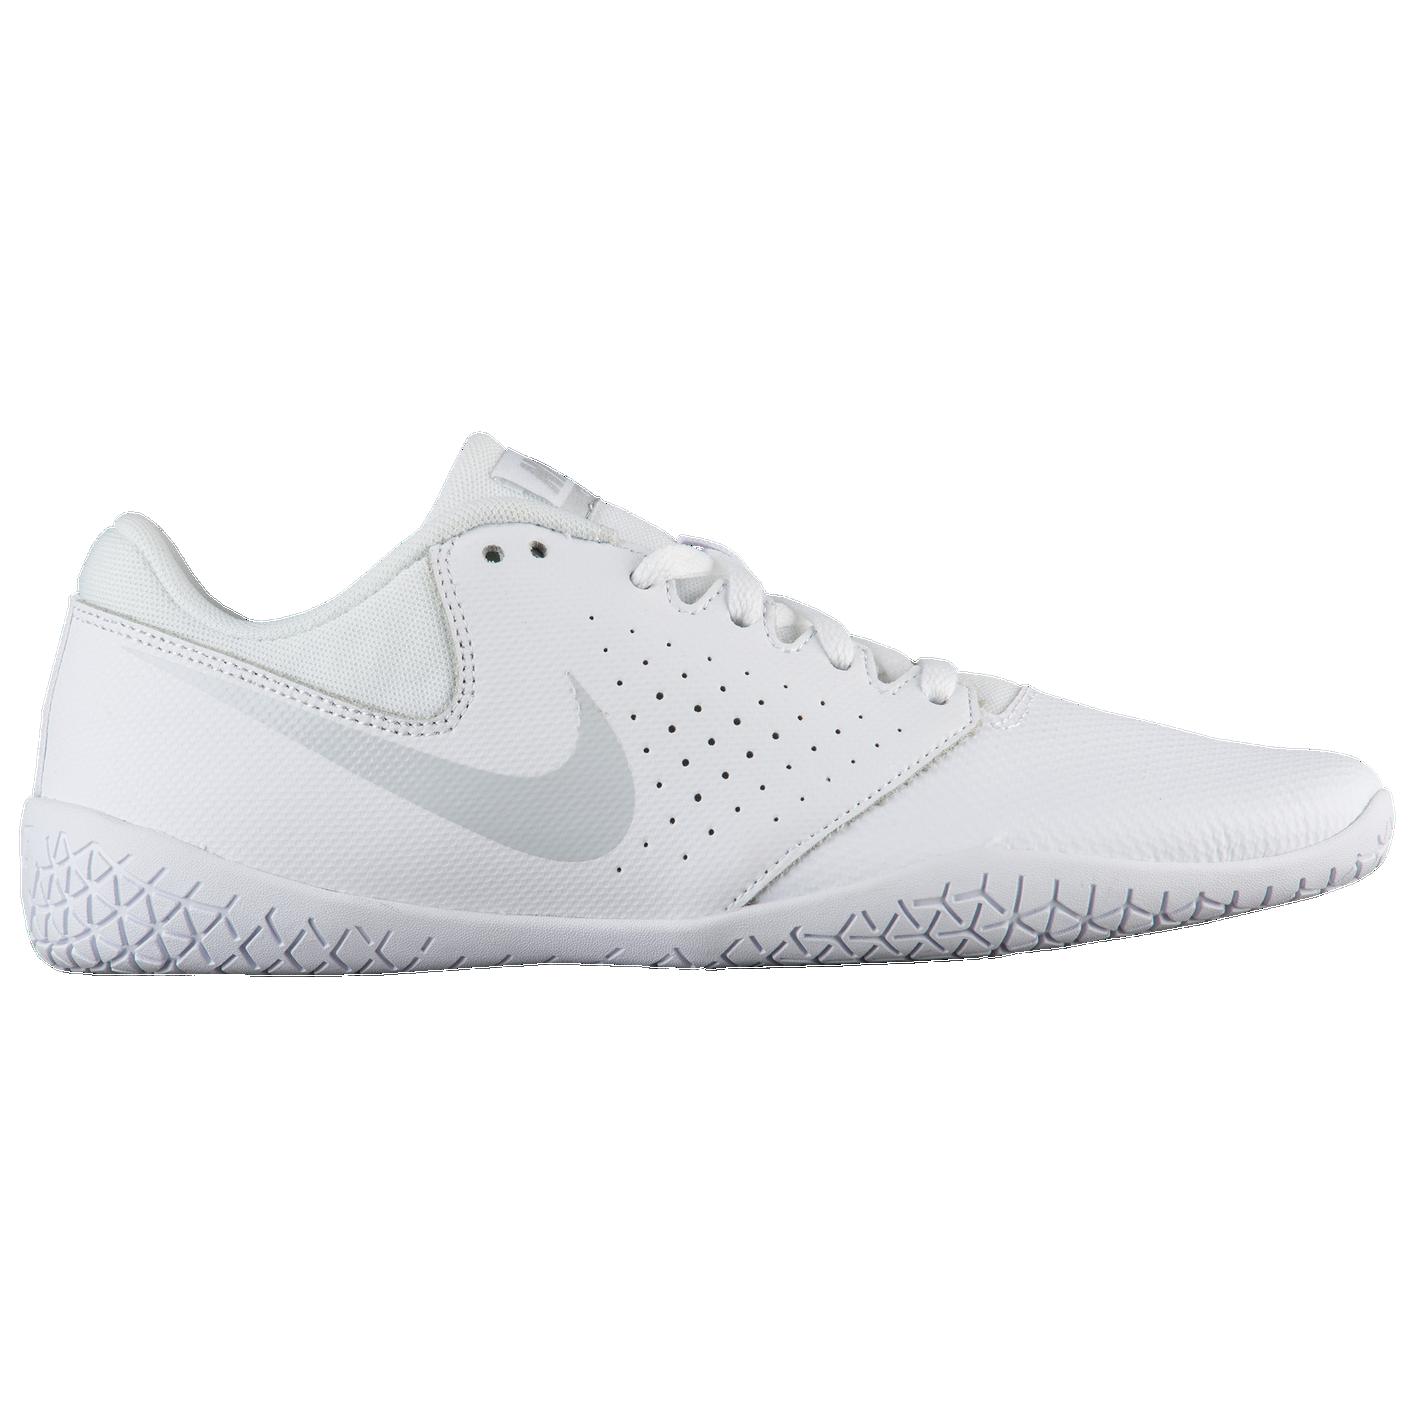 Nike Cheer Sideline IV - Women s - Cheer - Shoes - White Pure ... 776b2c372